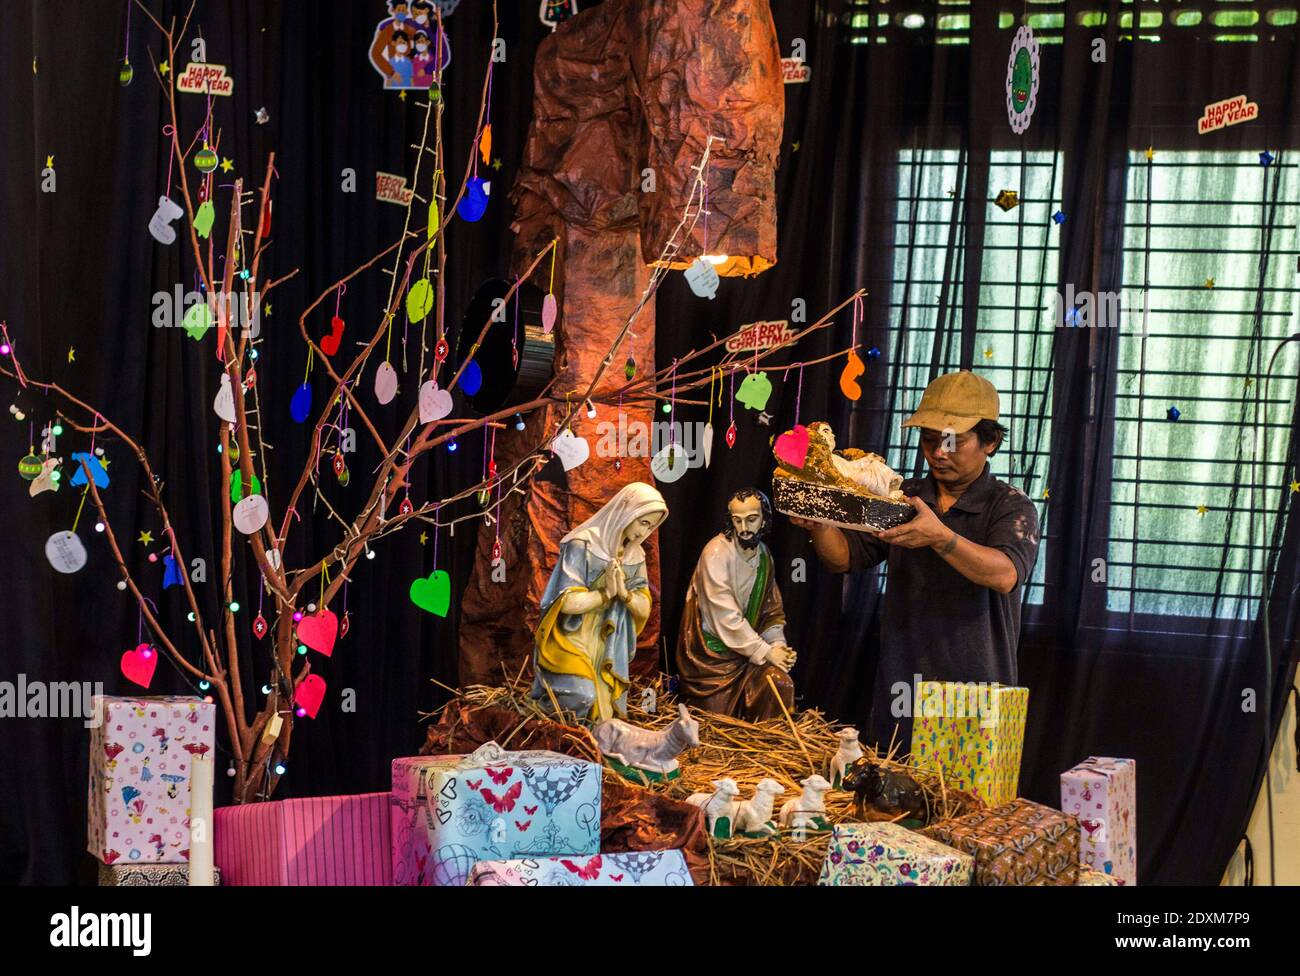 Sleman Yogyakarta Indonesia 24th Dec 2020 Catholics At The Saint Yusuf Chapel In Sleman Yogyakarta Prepare